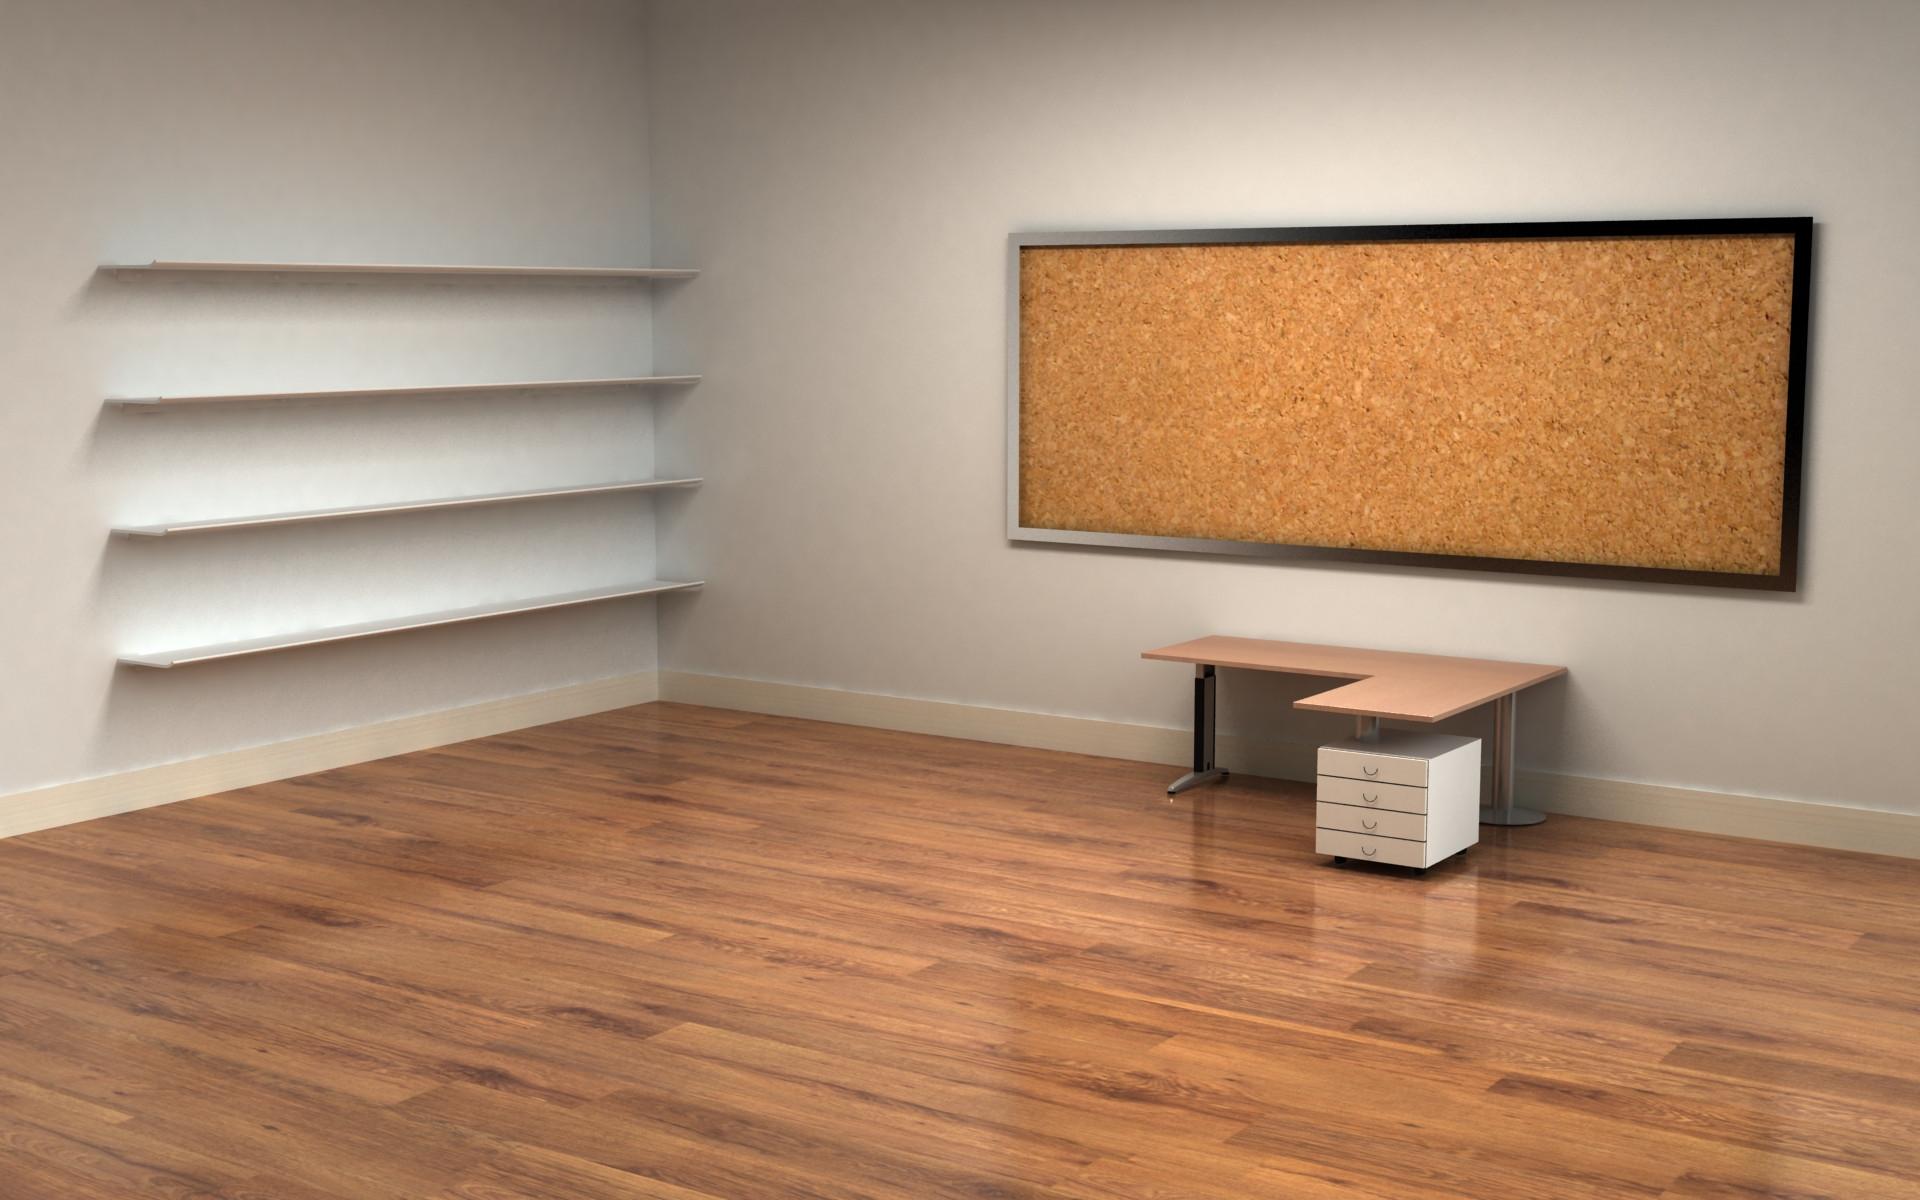 The Best Wallpaper Place  Buy Wallpaper Online  Designer